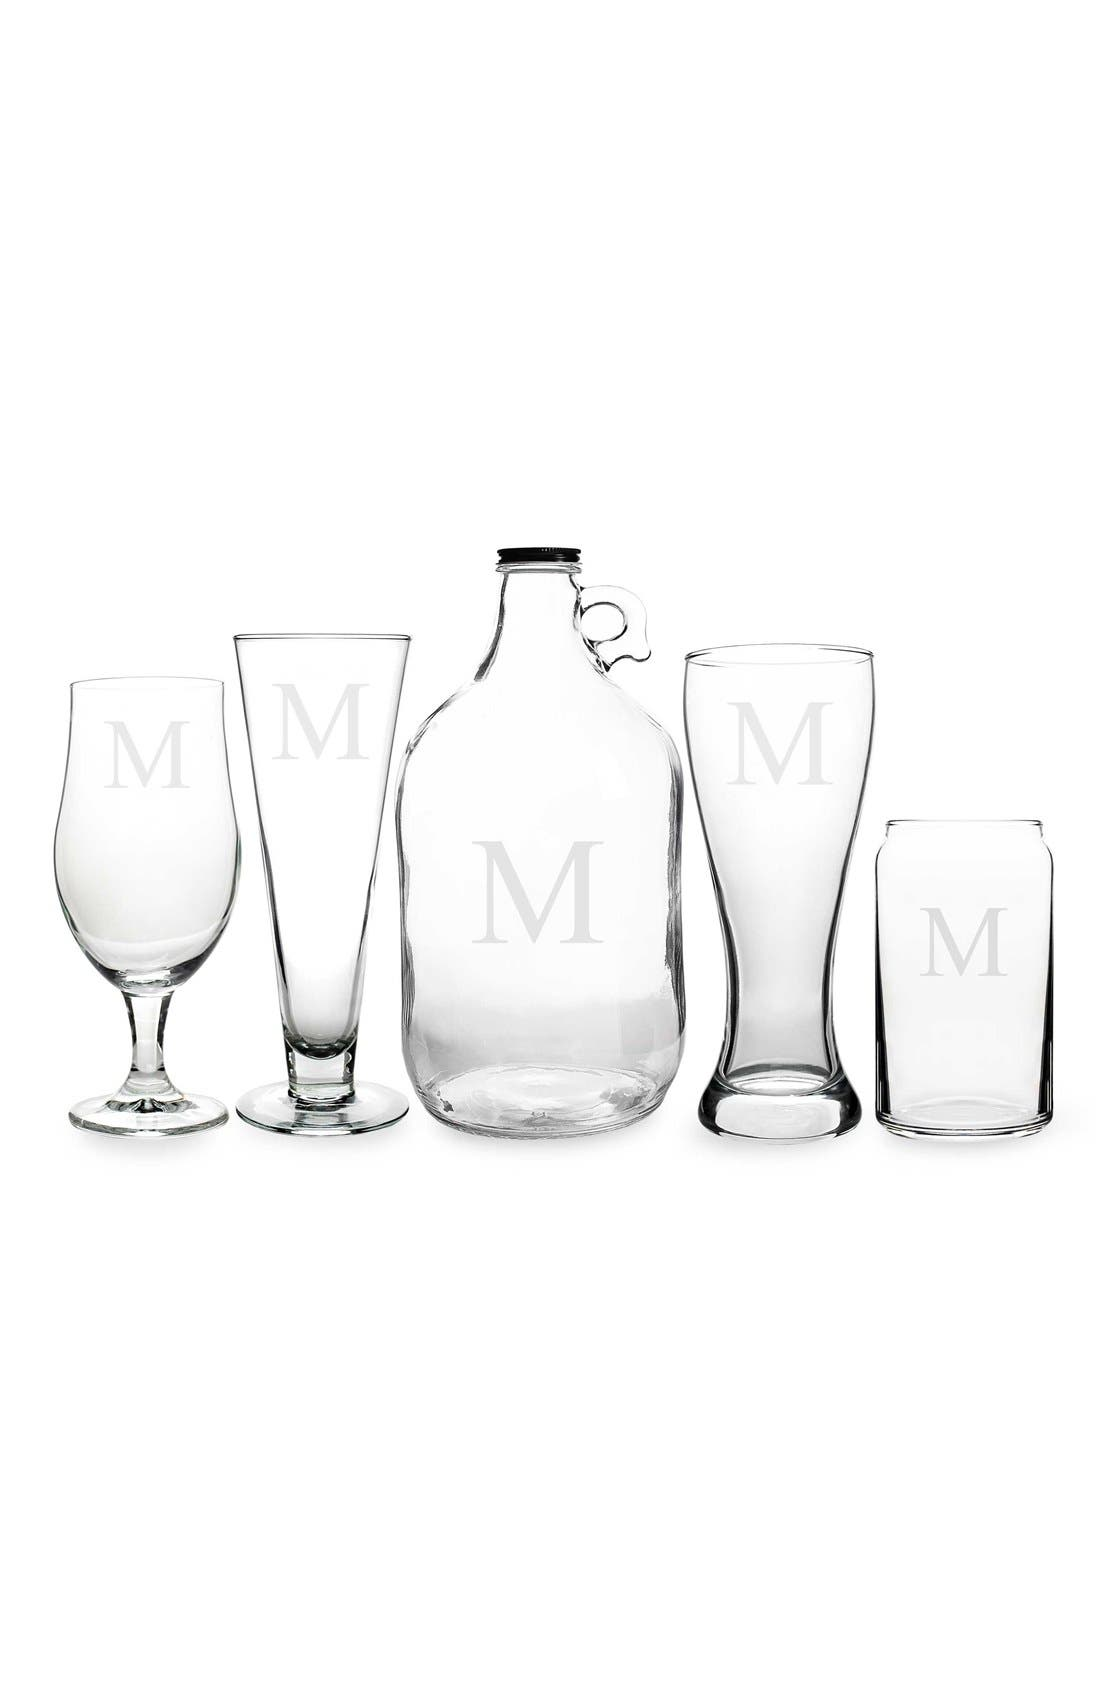 Main Image - Cathy's Concepts Monogram Craft Beer Set (Set of 5)